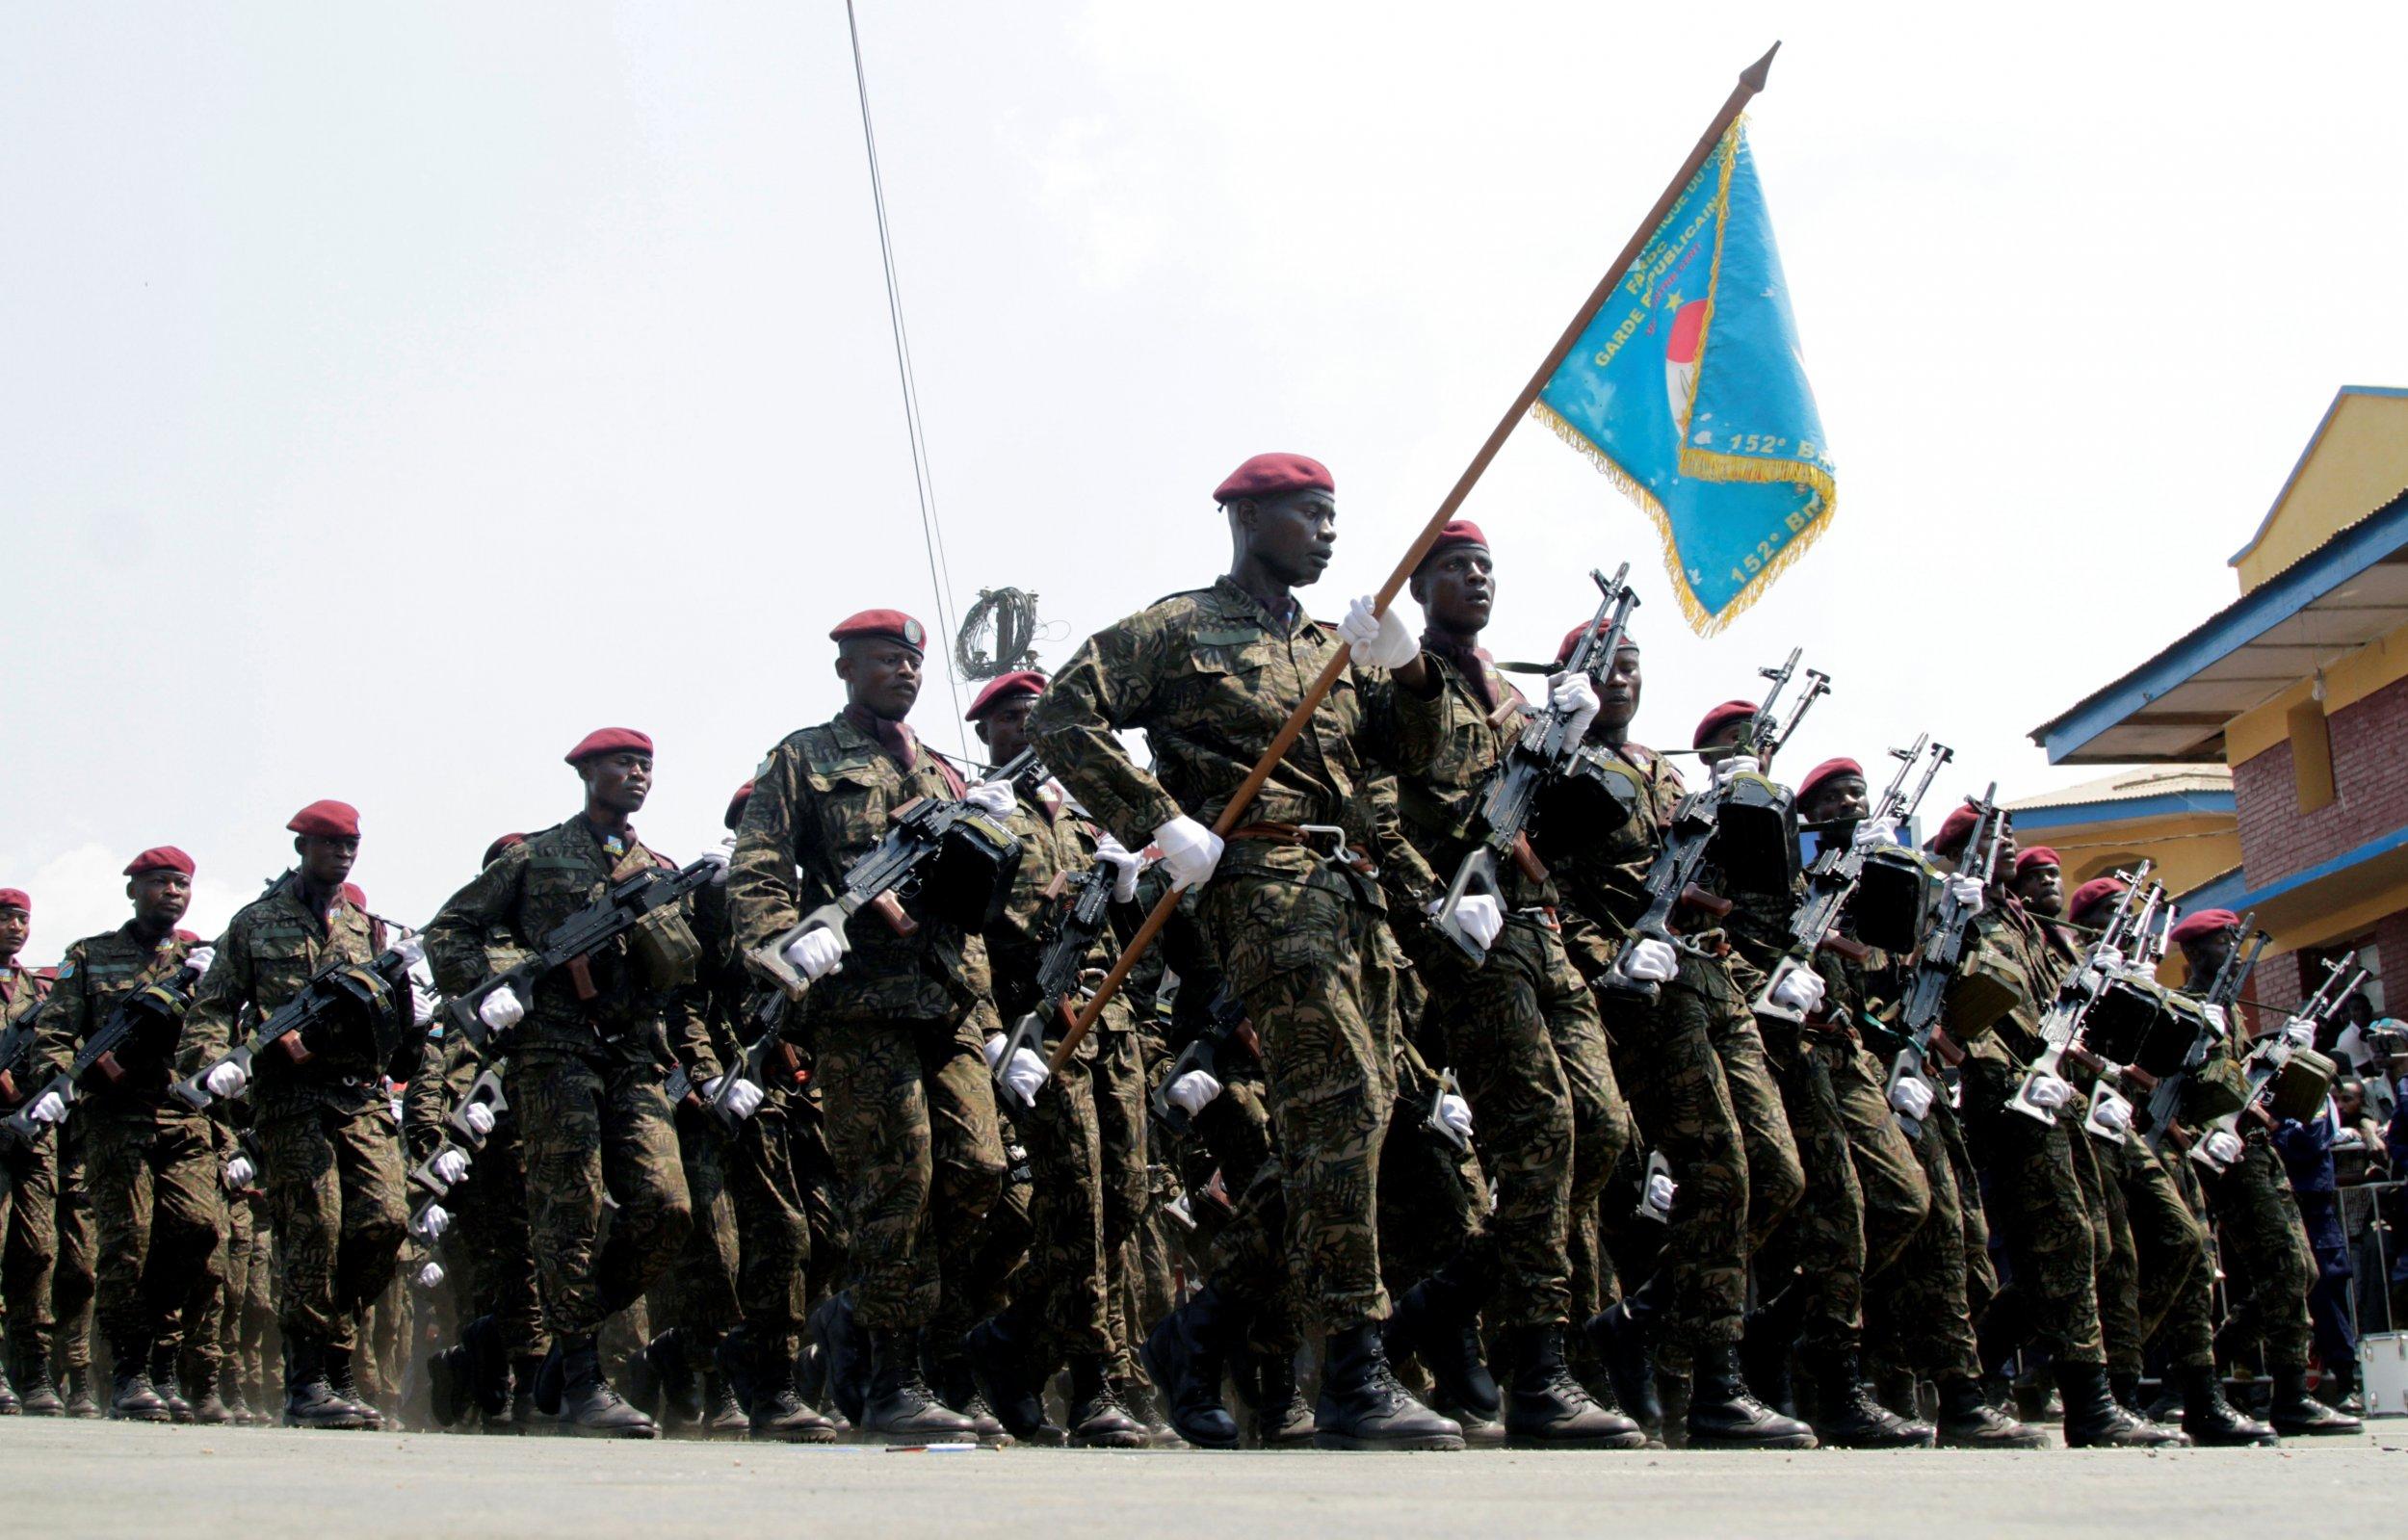 Congo army parade